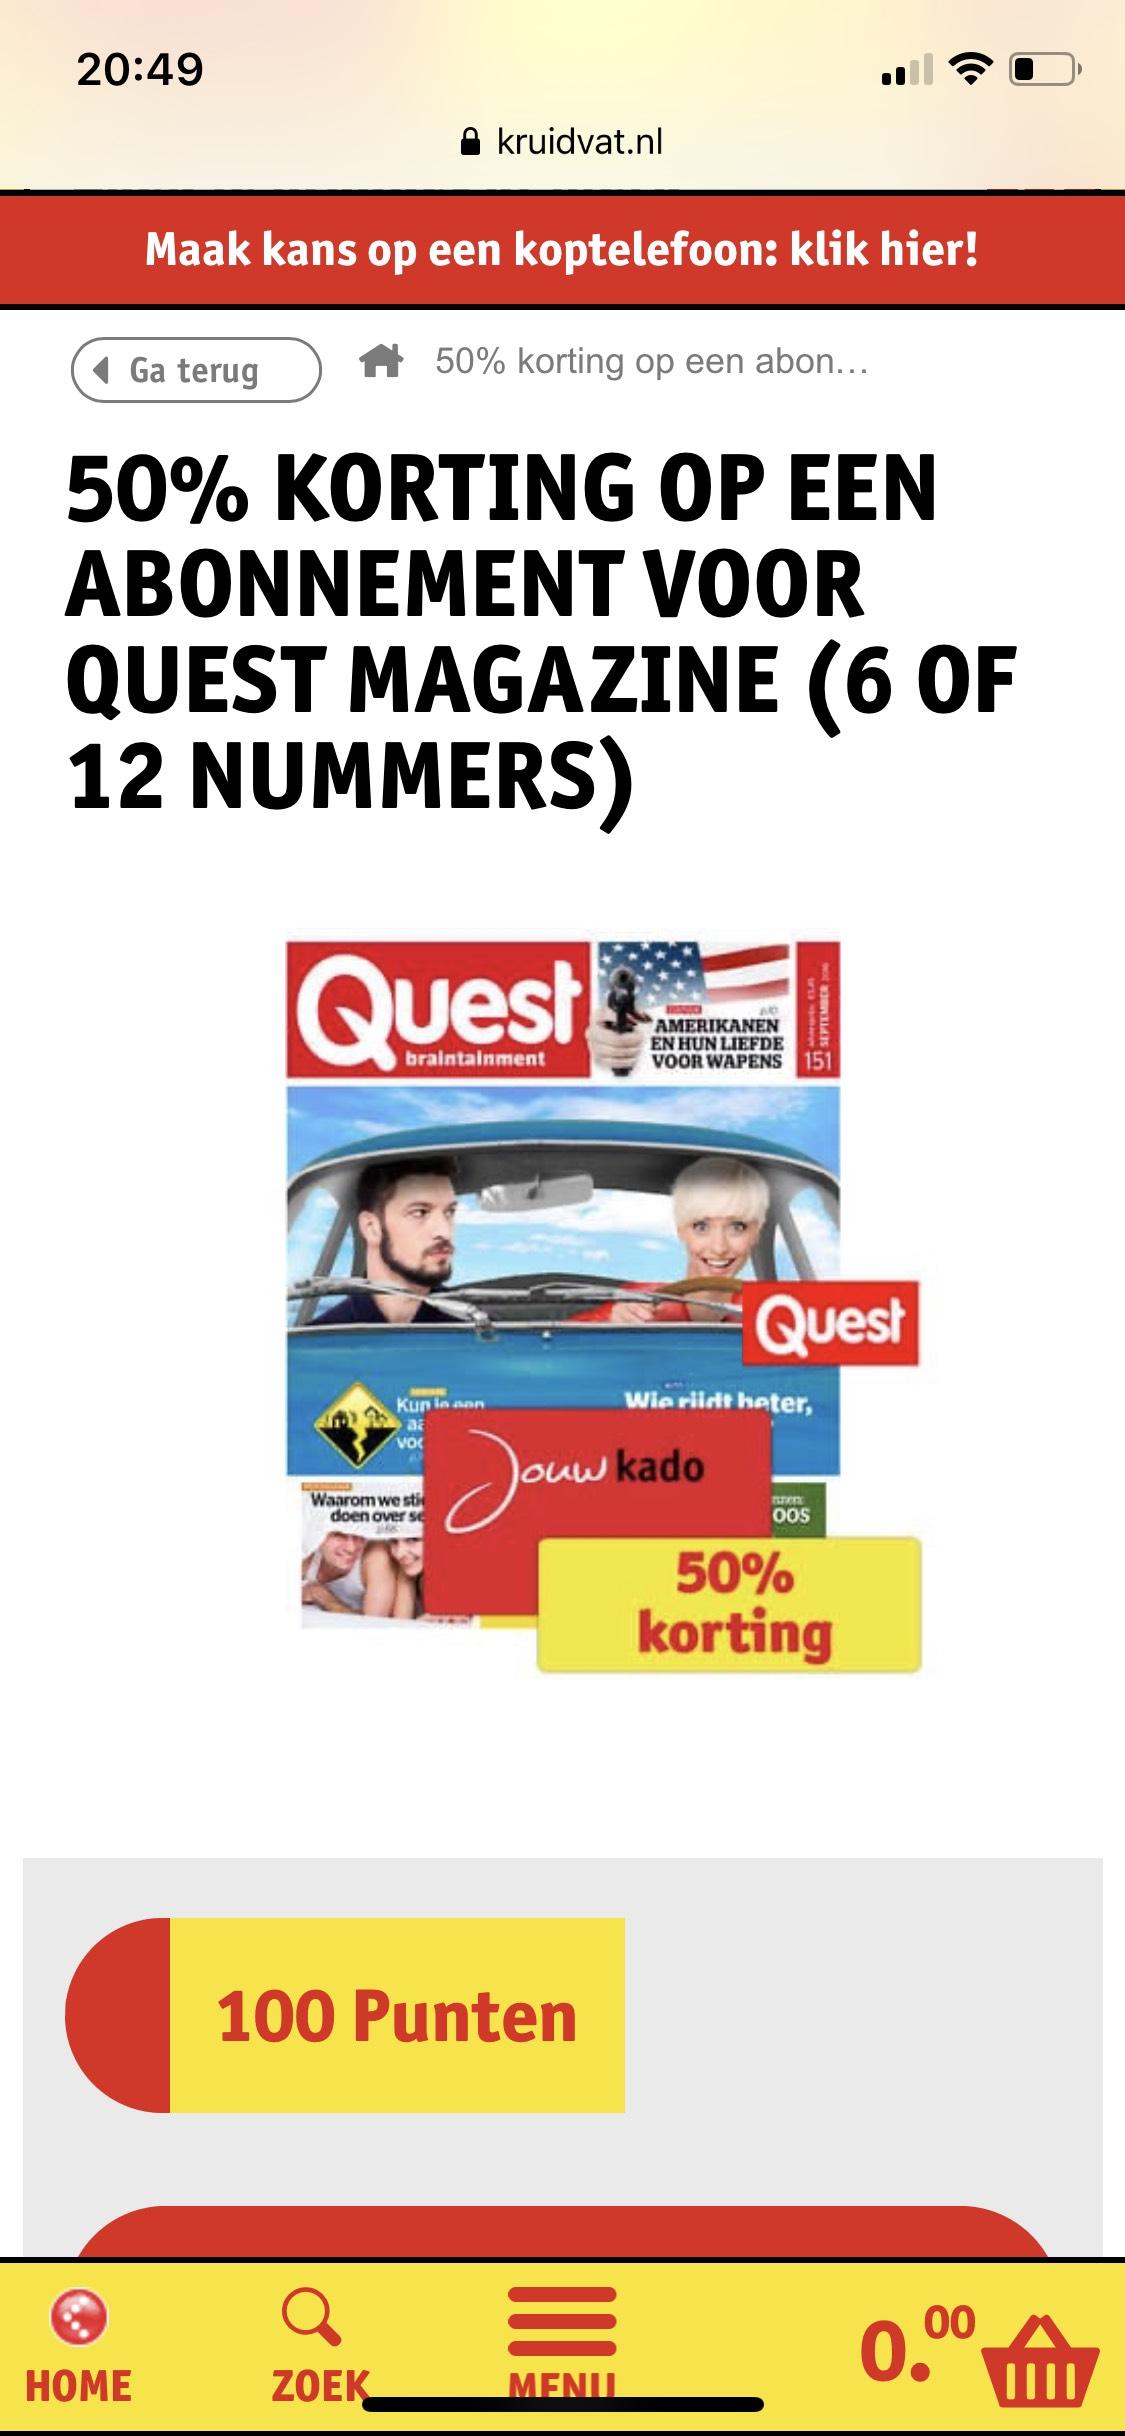 Kruidvat: 50% korting op abonnement Quest tegen inlevering van 100 punten